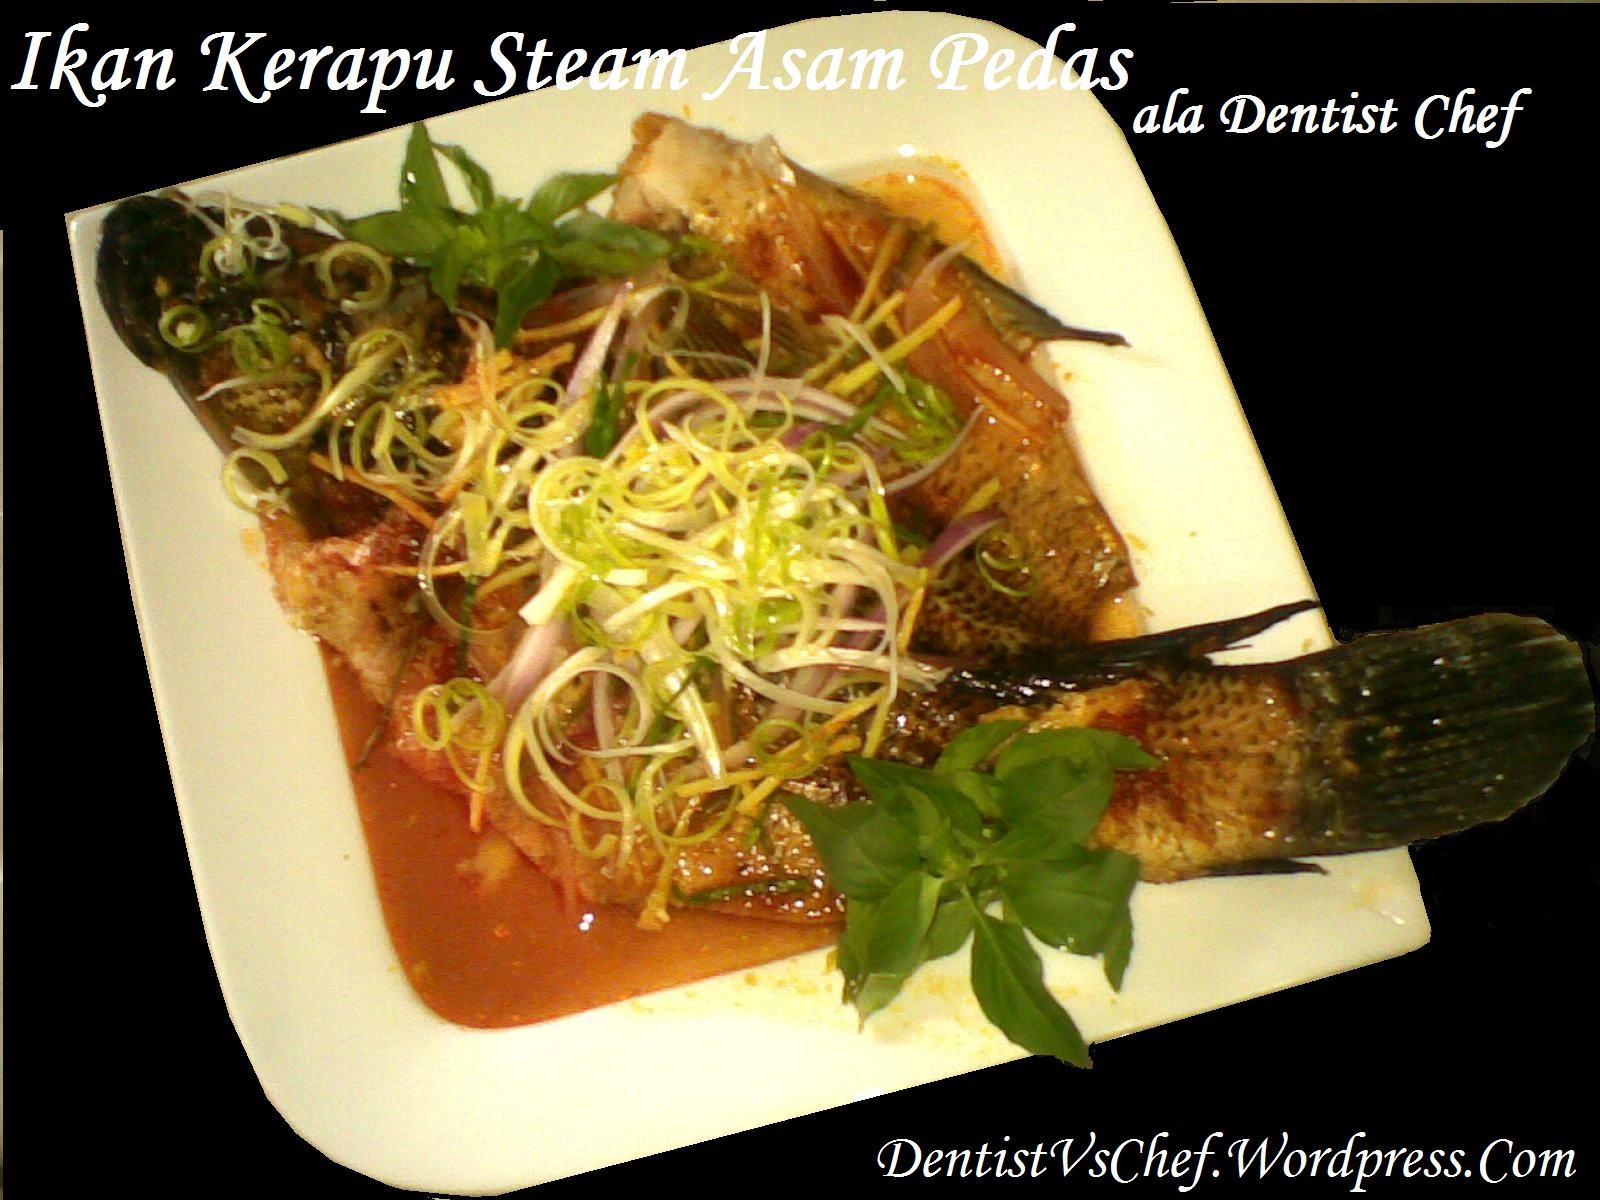 Resep Ikan Kerapu/ Malas Steam Asam Pedas khas Thailand ala Dentist ...